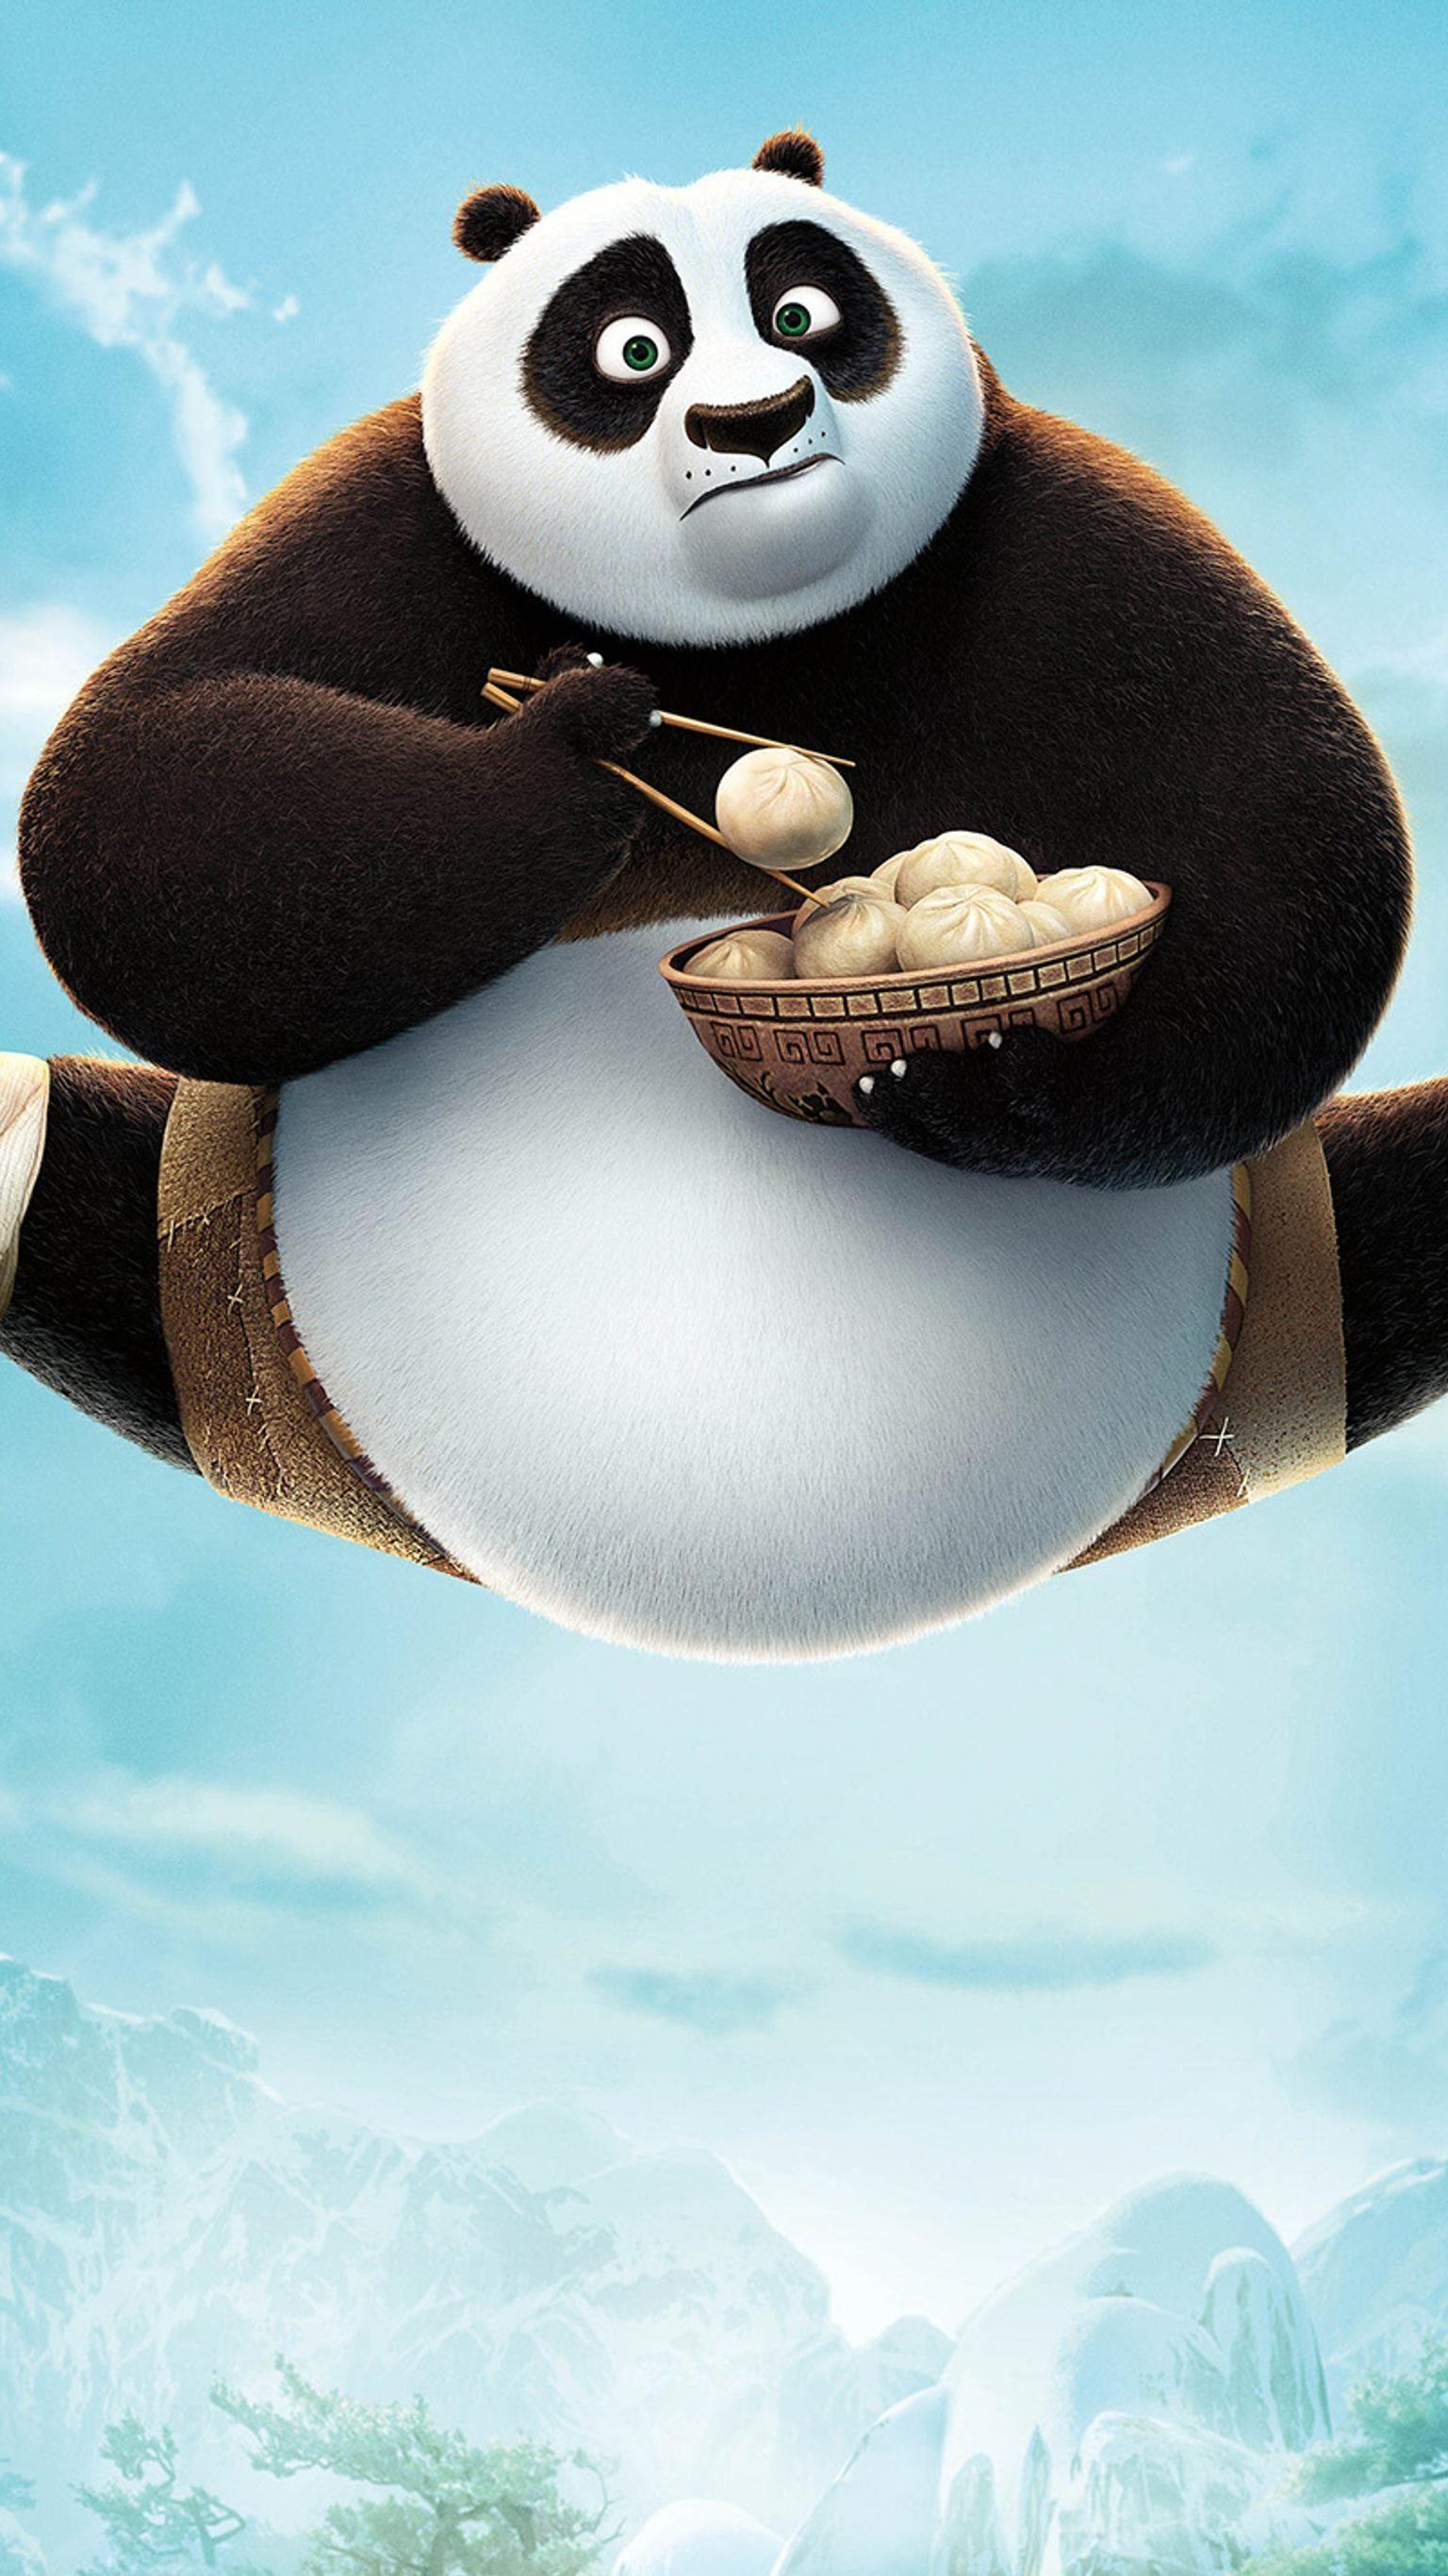 Kung Fu Panda 3 2016 Fond d39écran du téléphone  Moviemania  Cartoon Kung Fu Panda 3 2016 Fond décran du téléphone  Moviemania...